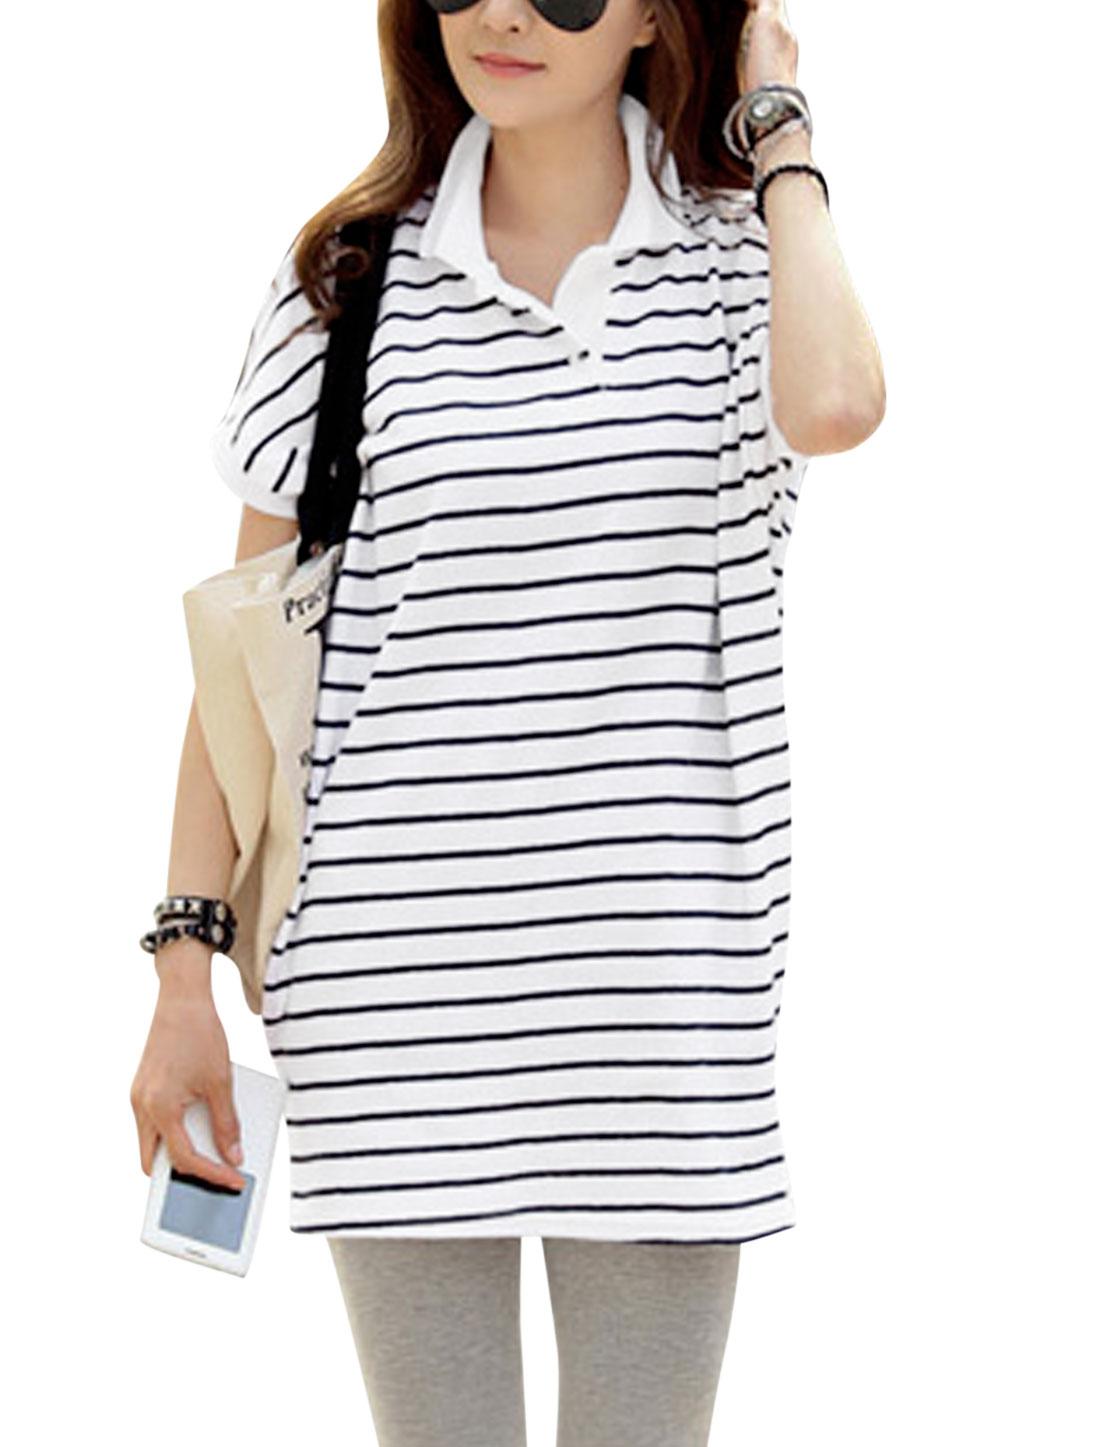 Women Rib Knit Point Collar Short Batwing Sleeve Tunic T-Shirt Black White S